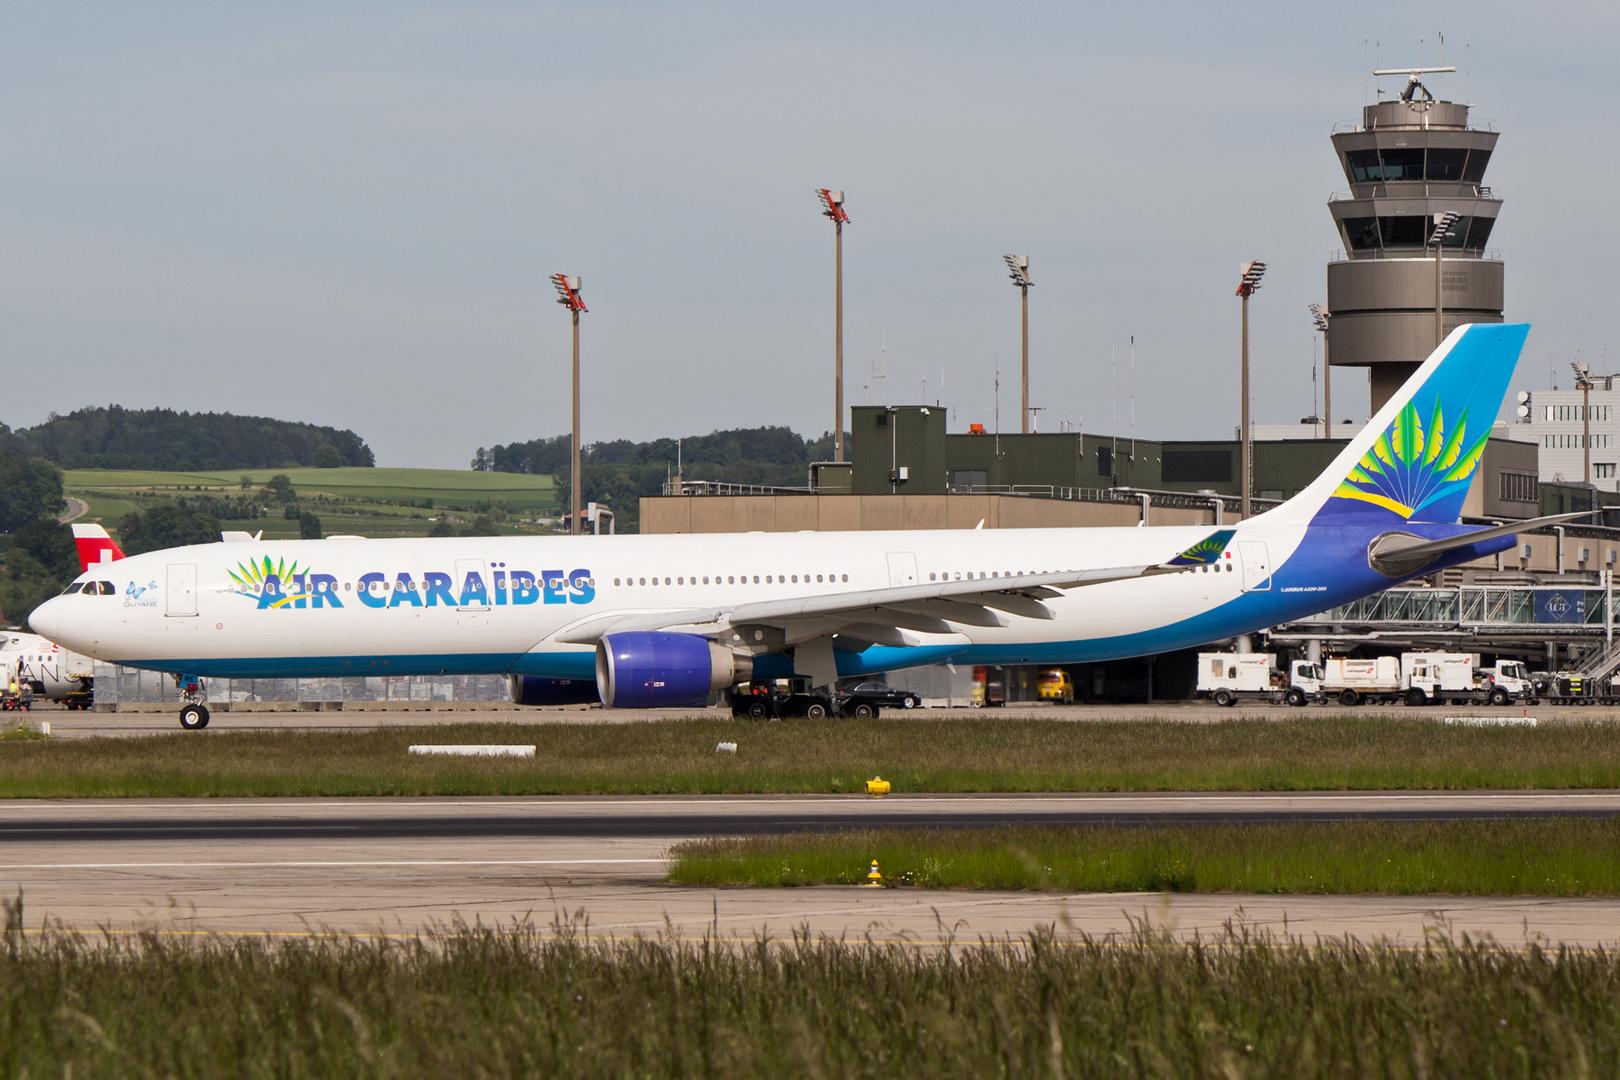 Air Caraïbes, A330-323, F-OONE, in ZRH